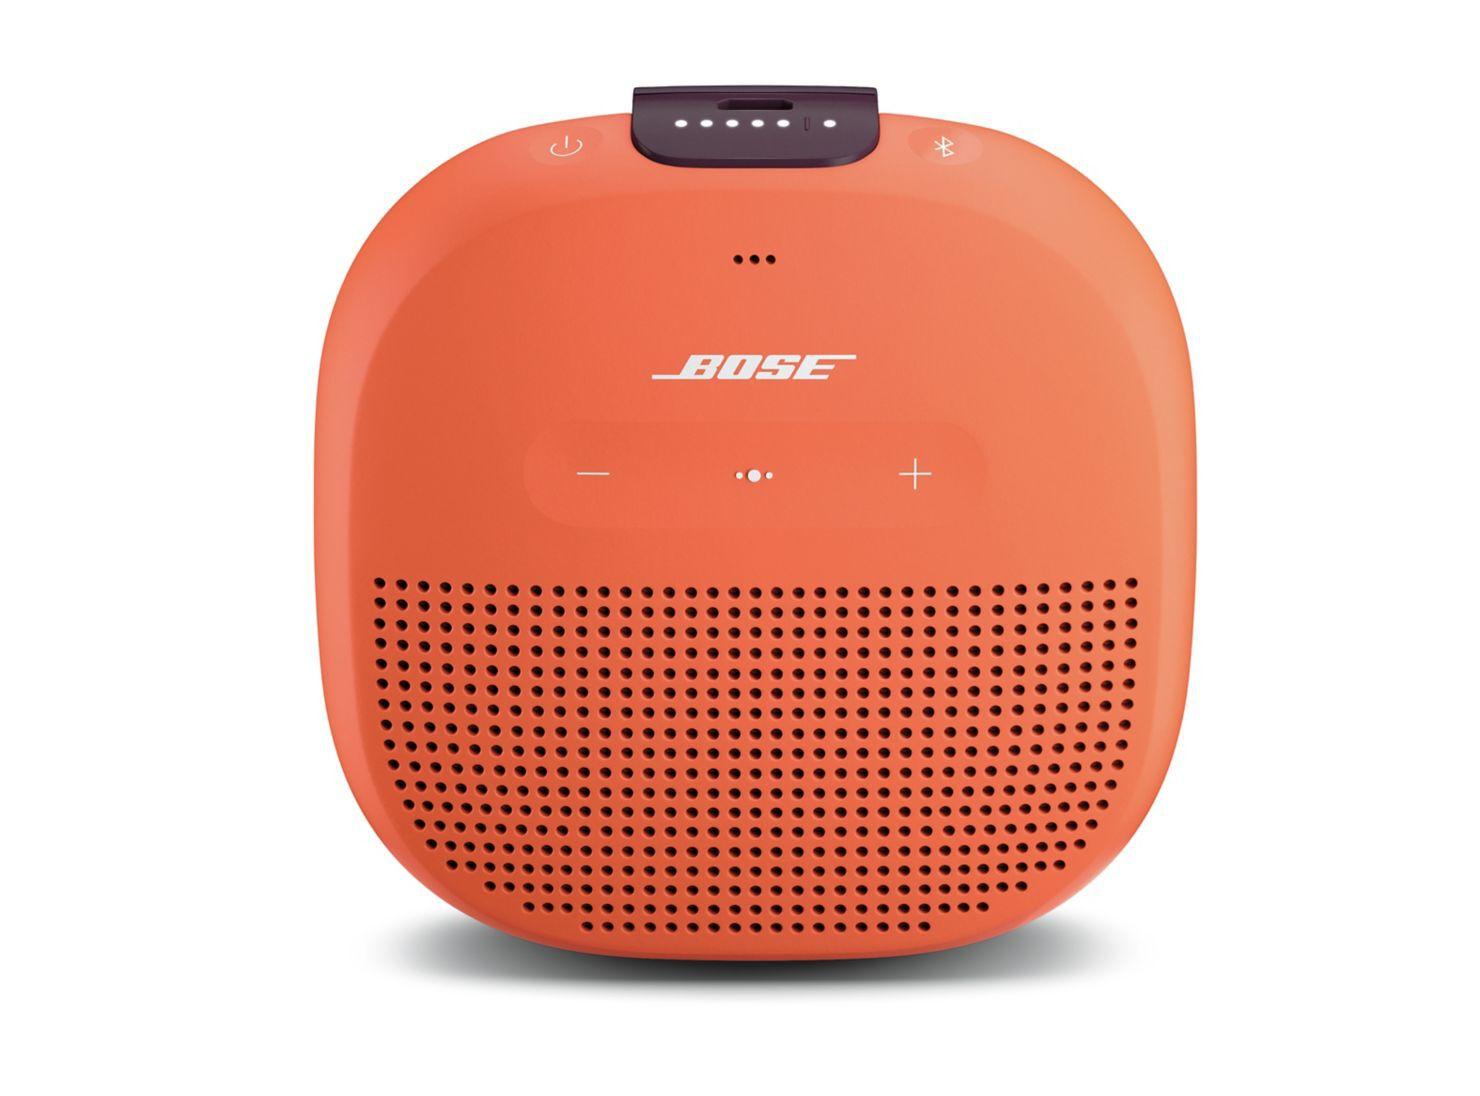 d1f1656542da Parlante Bose Soundlink Micro Bluetooth Naranjo en Audio